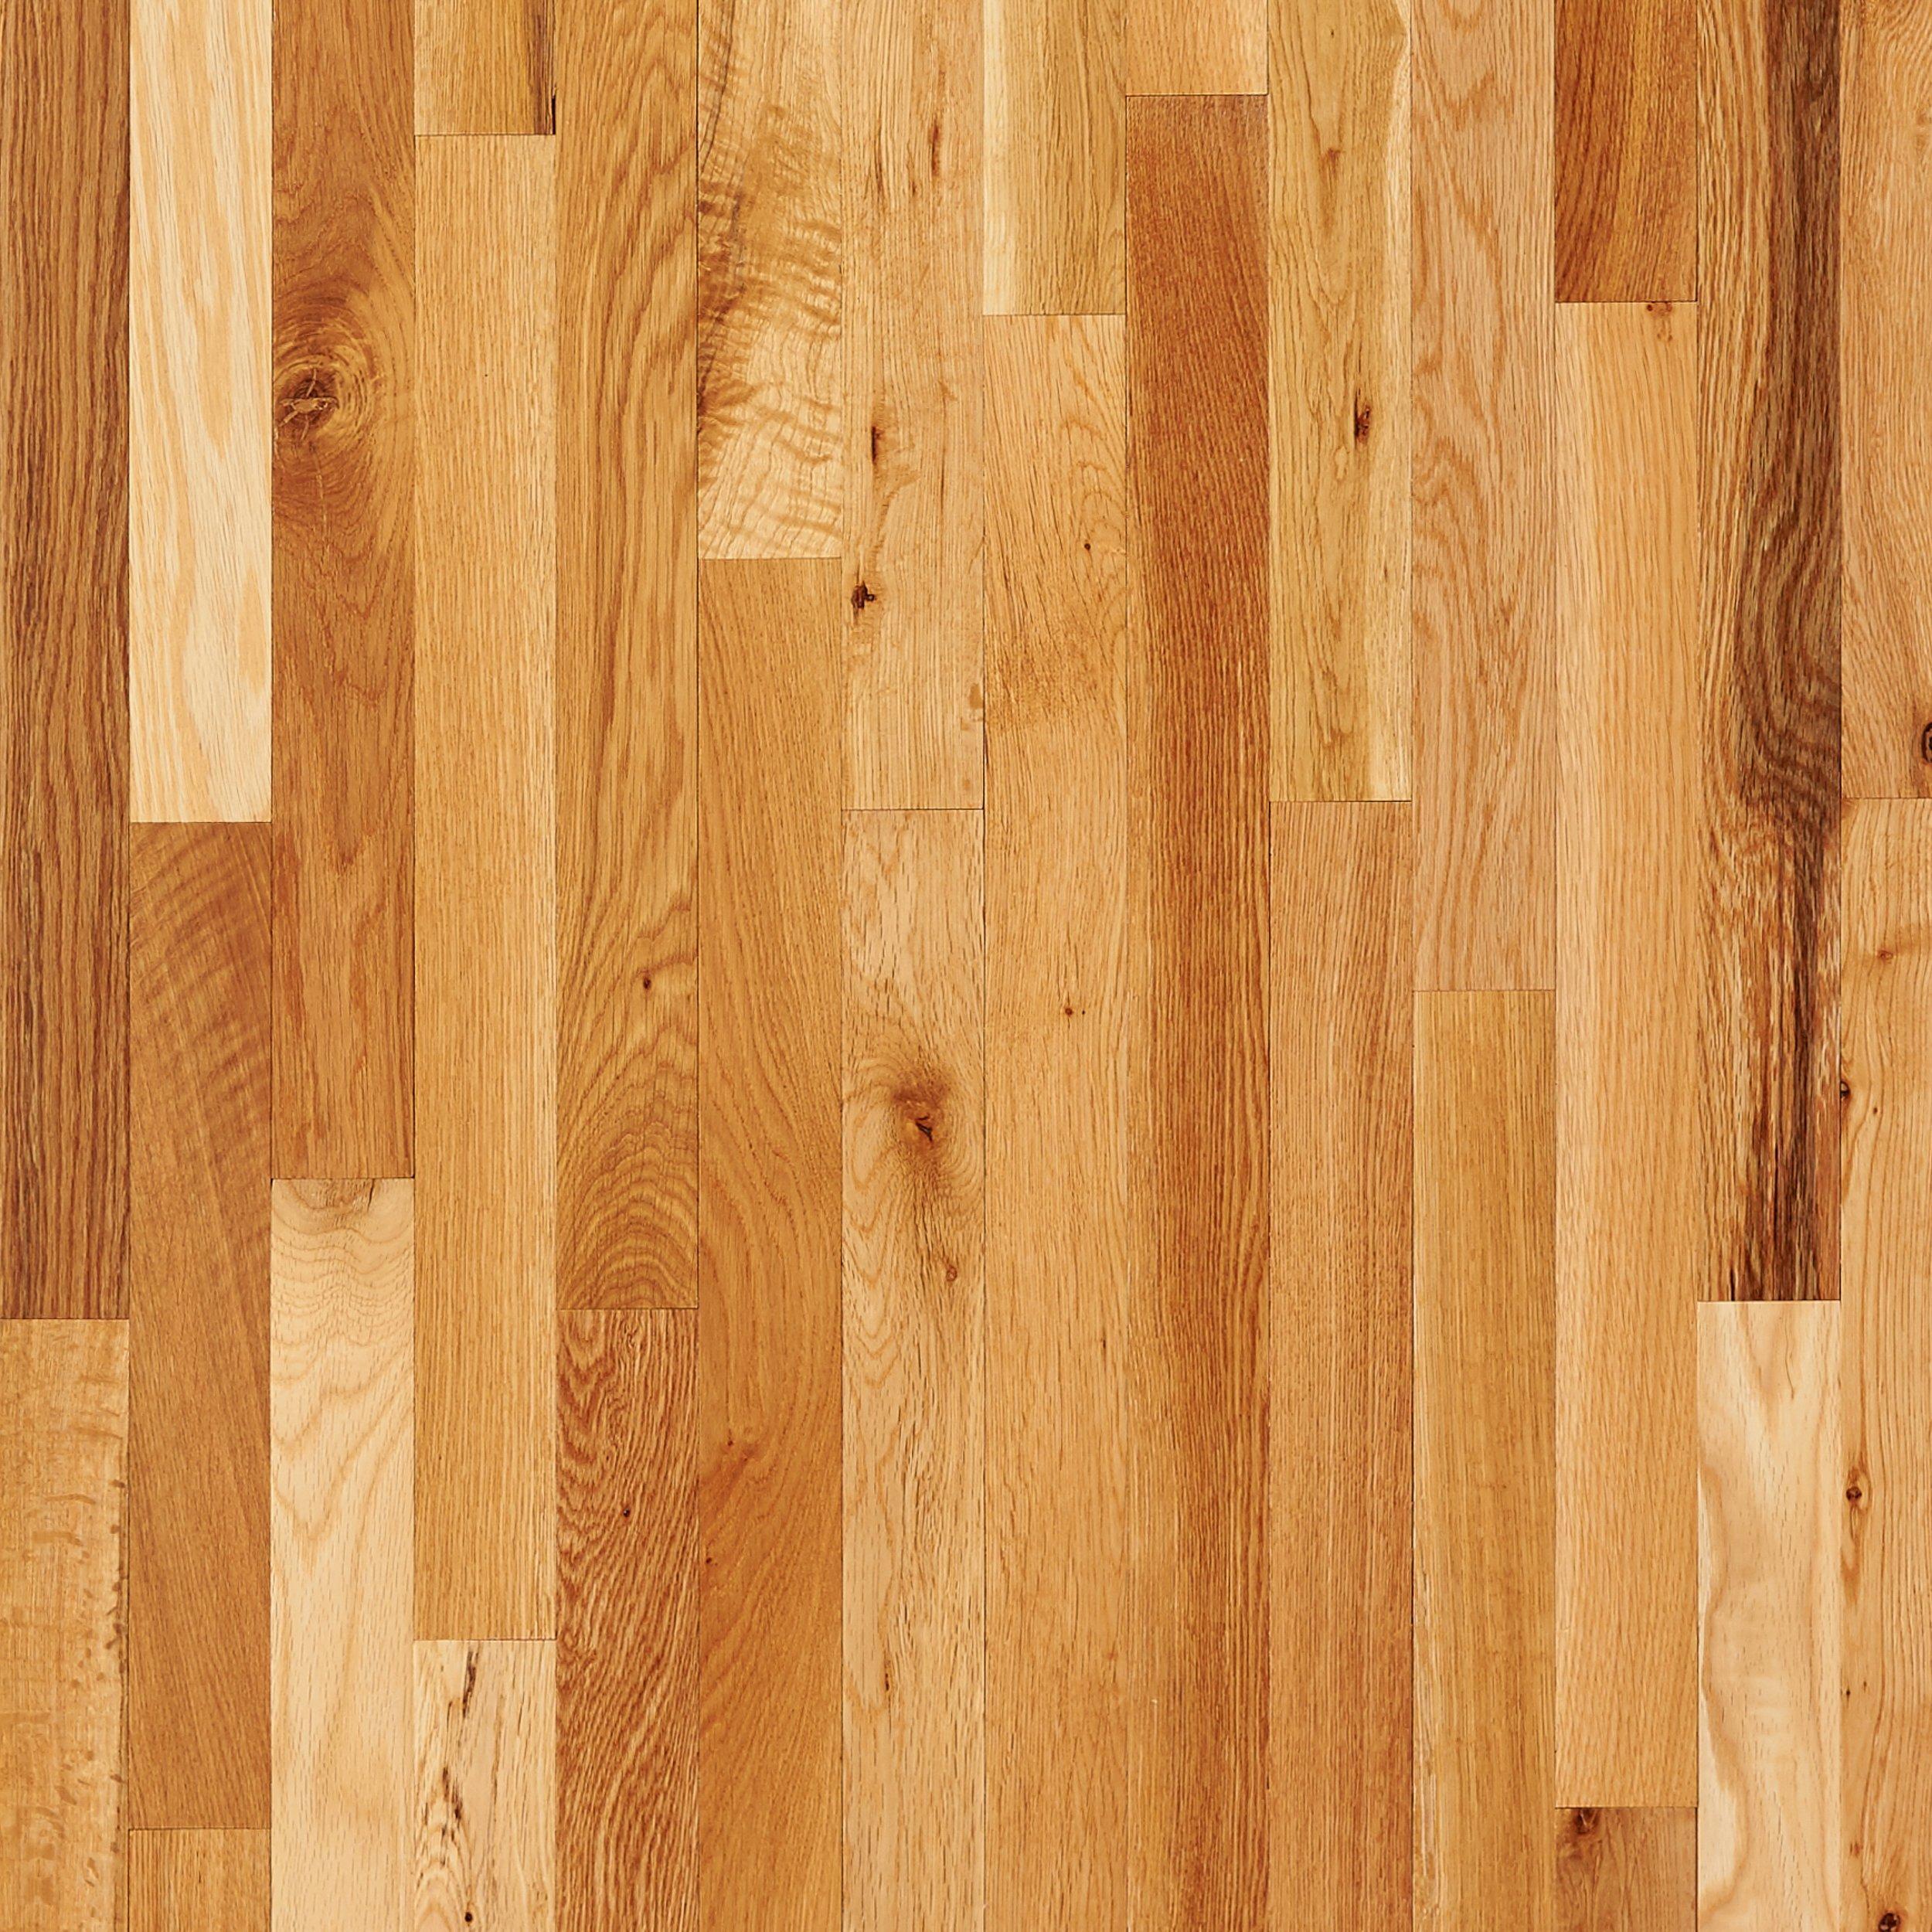 wood flooring natural oak smooth solid hardwood TJMYHUT